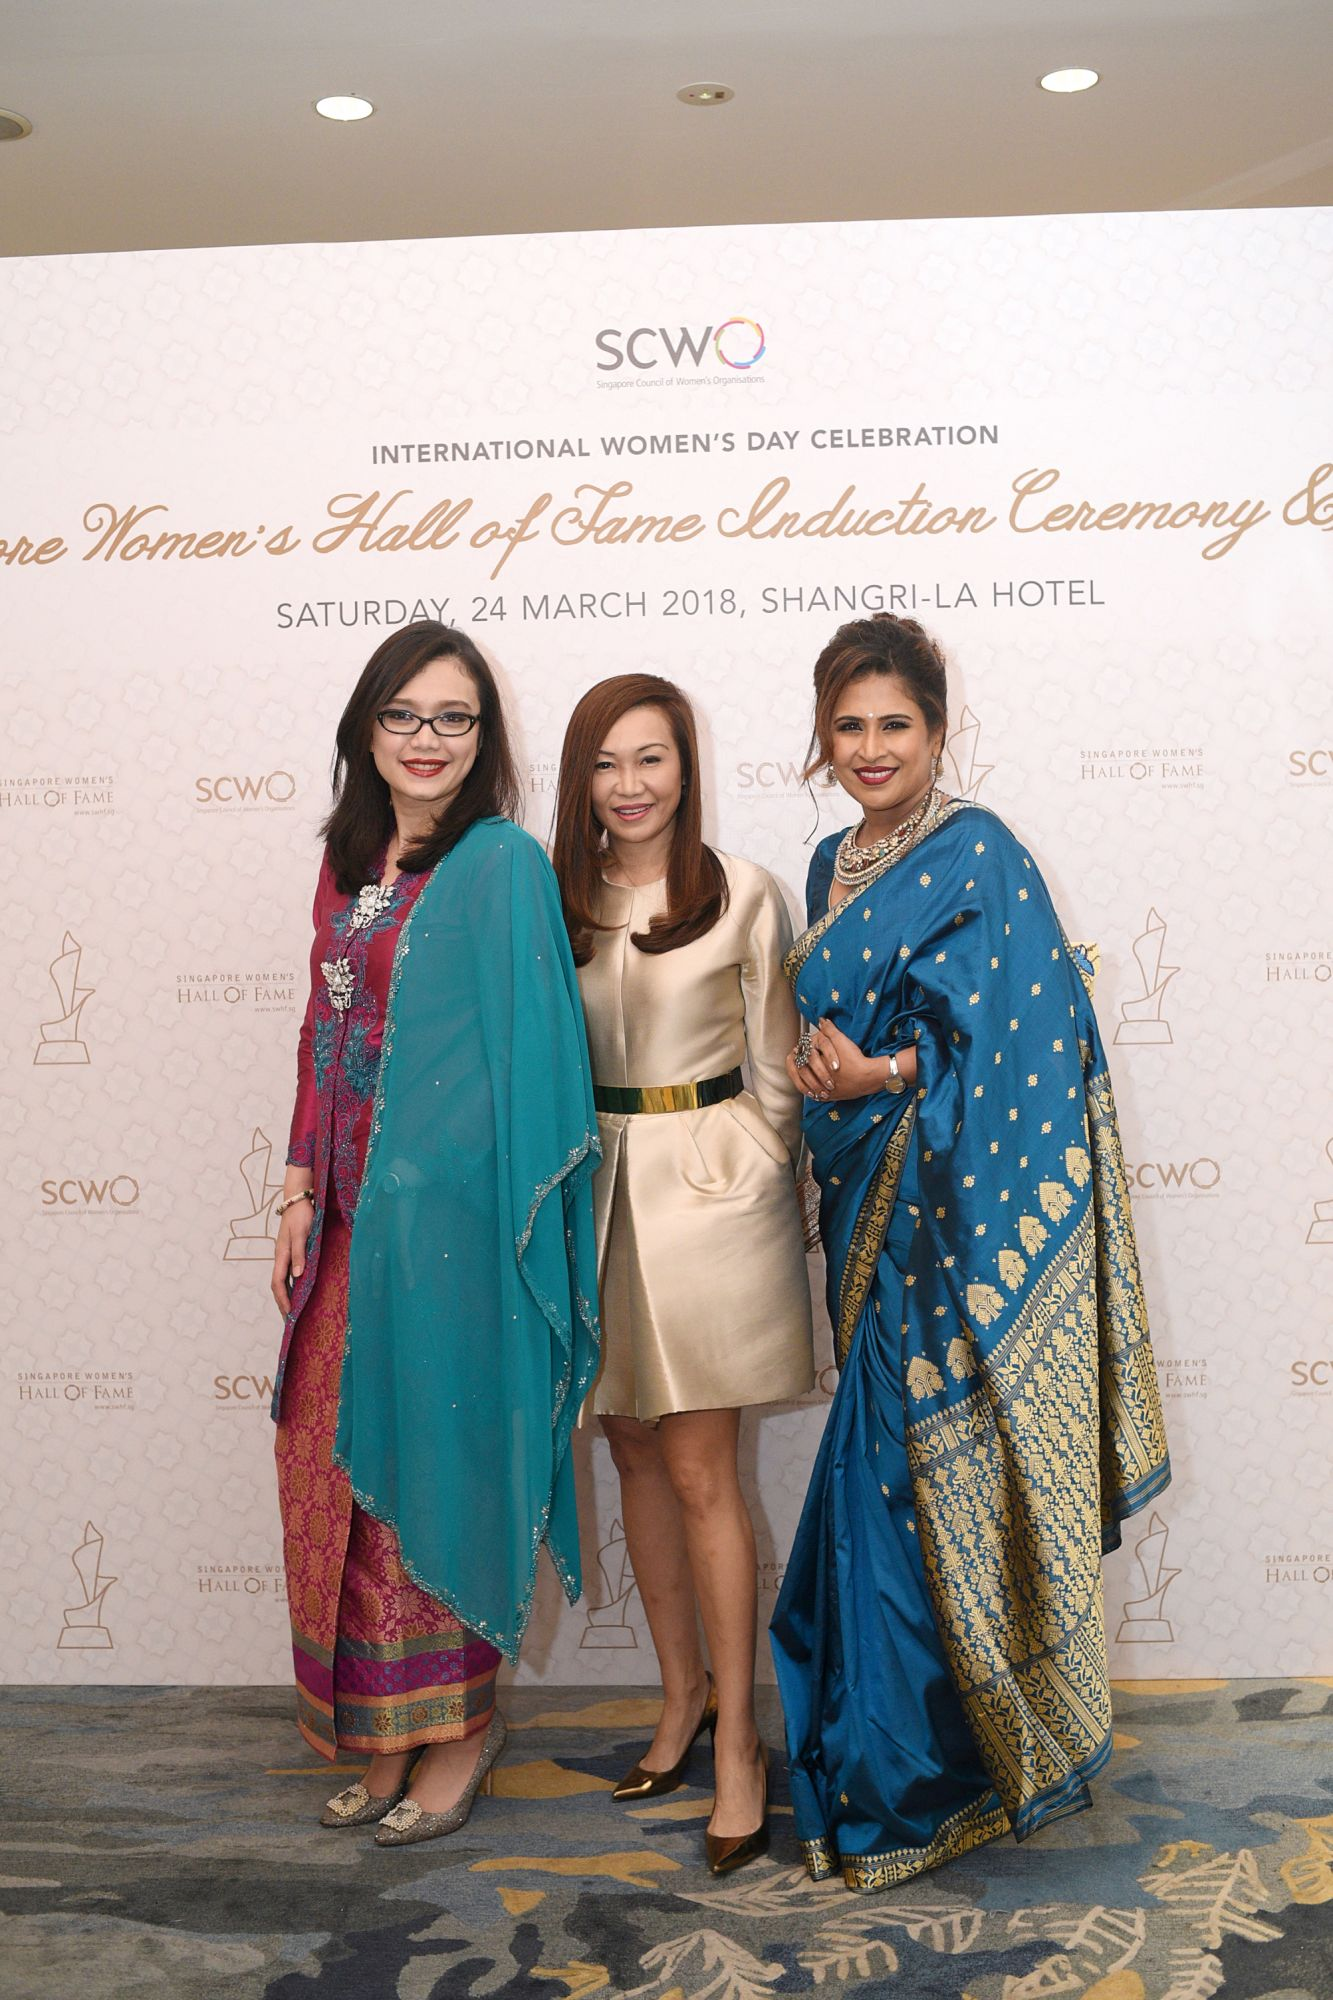 Hazlina Amran-Halim, Trina Liang-Lin, Lavinia Thanapathy